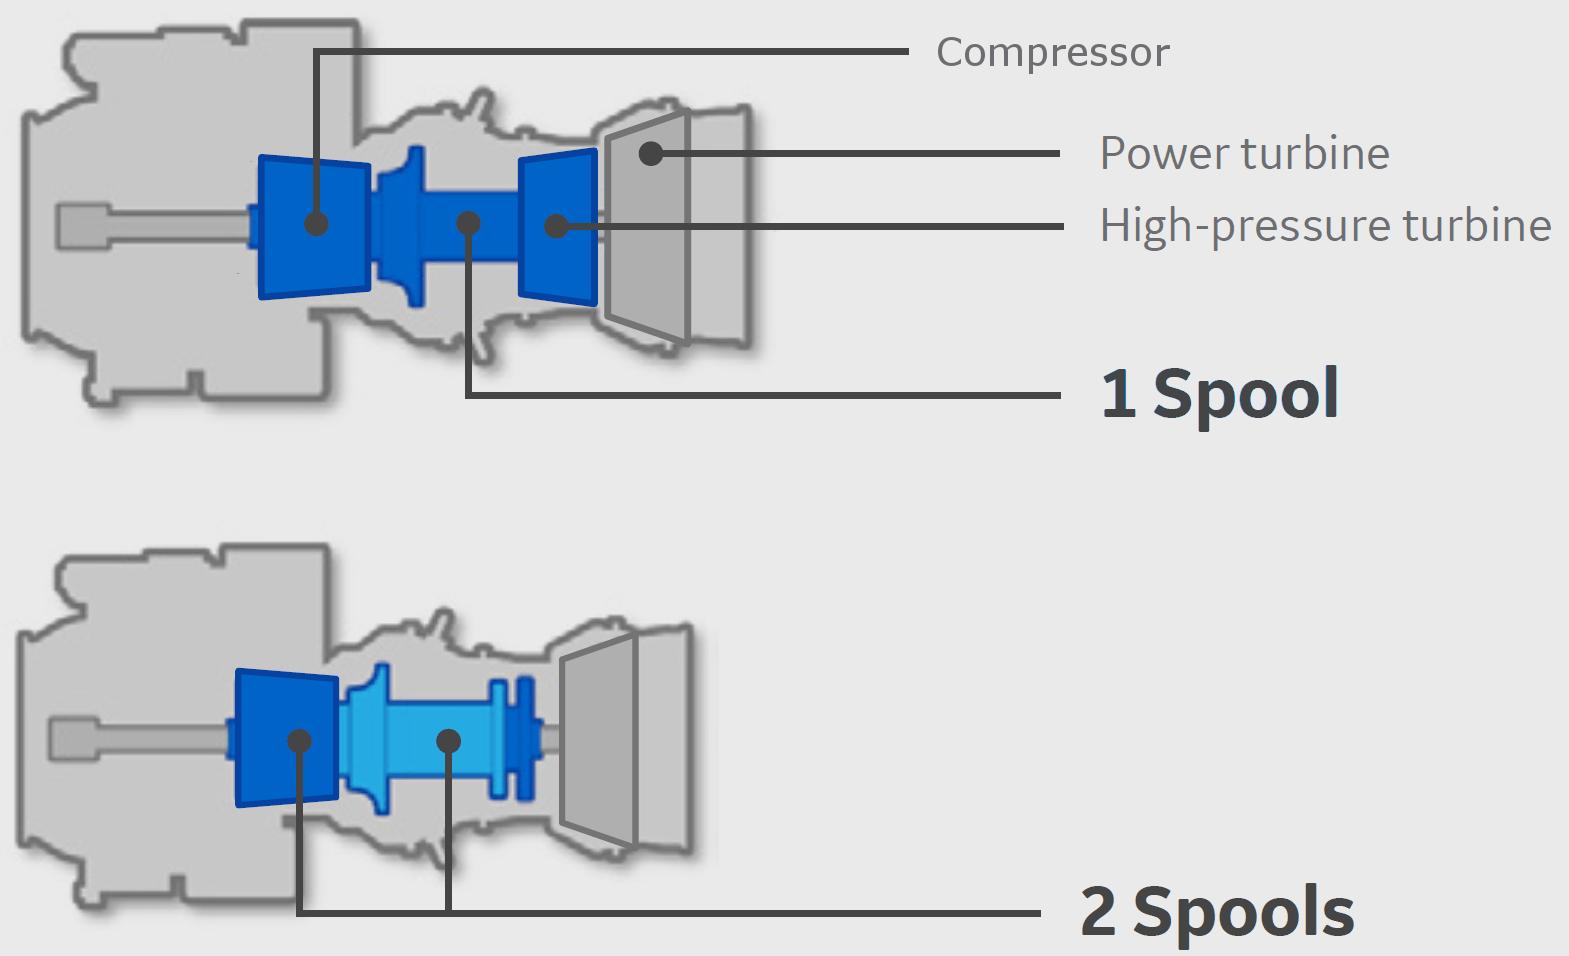 hight resolution of single spool engines have a single compressor turbine spool while dual